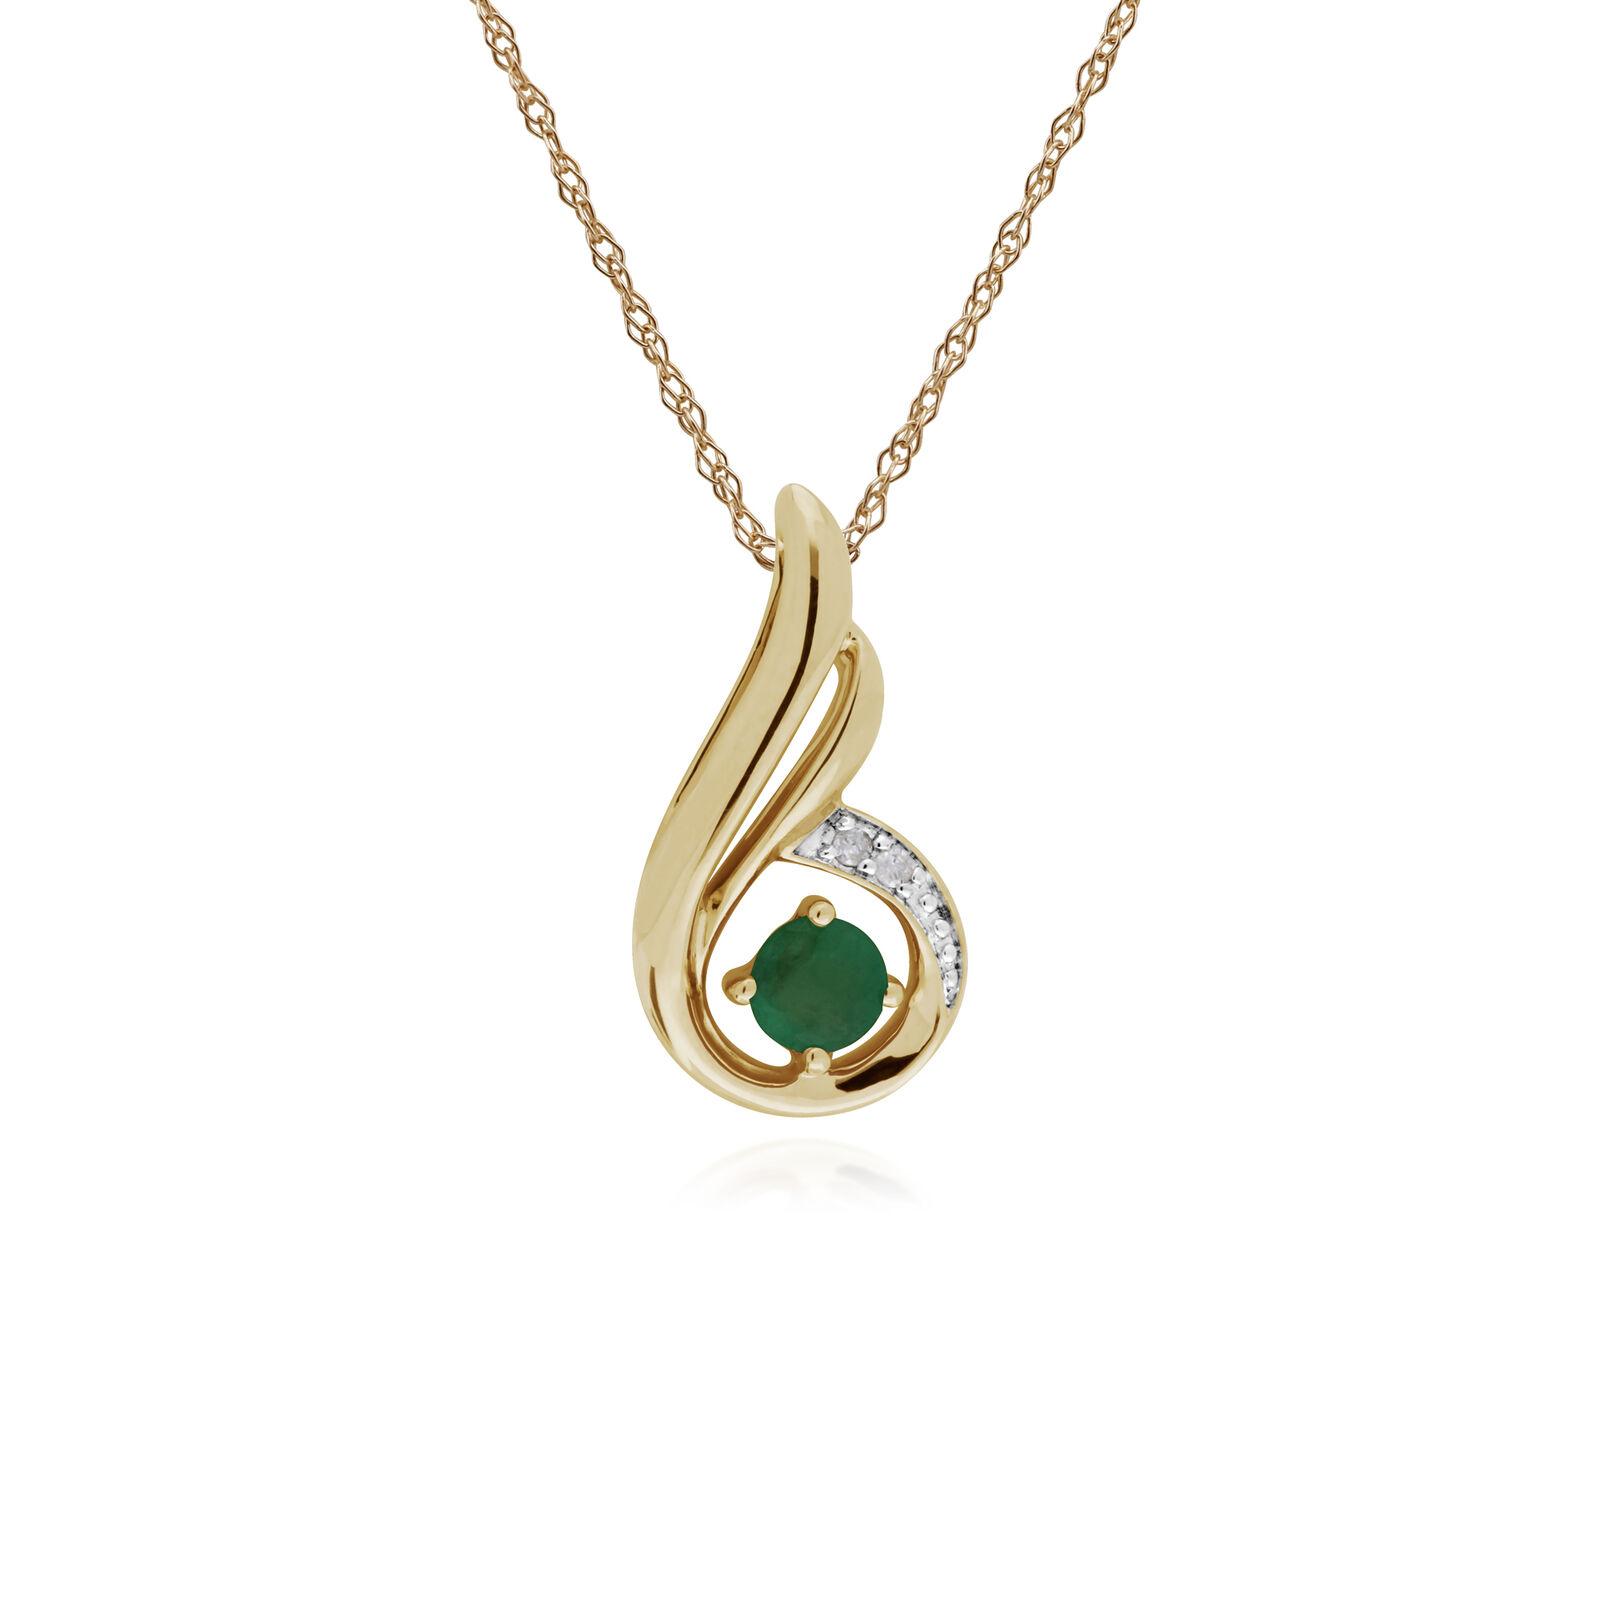 Gemondo 9ct Yellow gold Emerald & Diamond Spiral Pendant with 45cm Chain